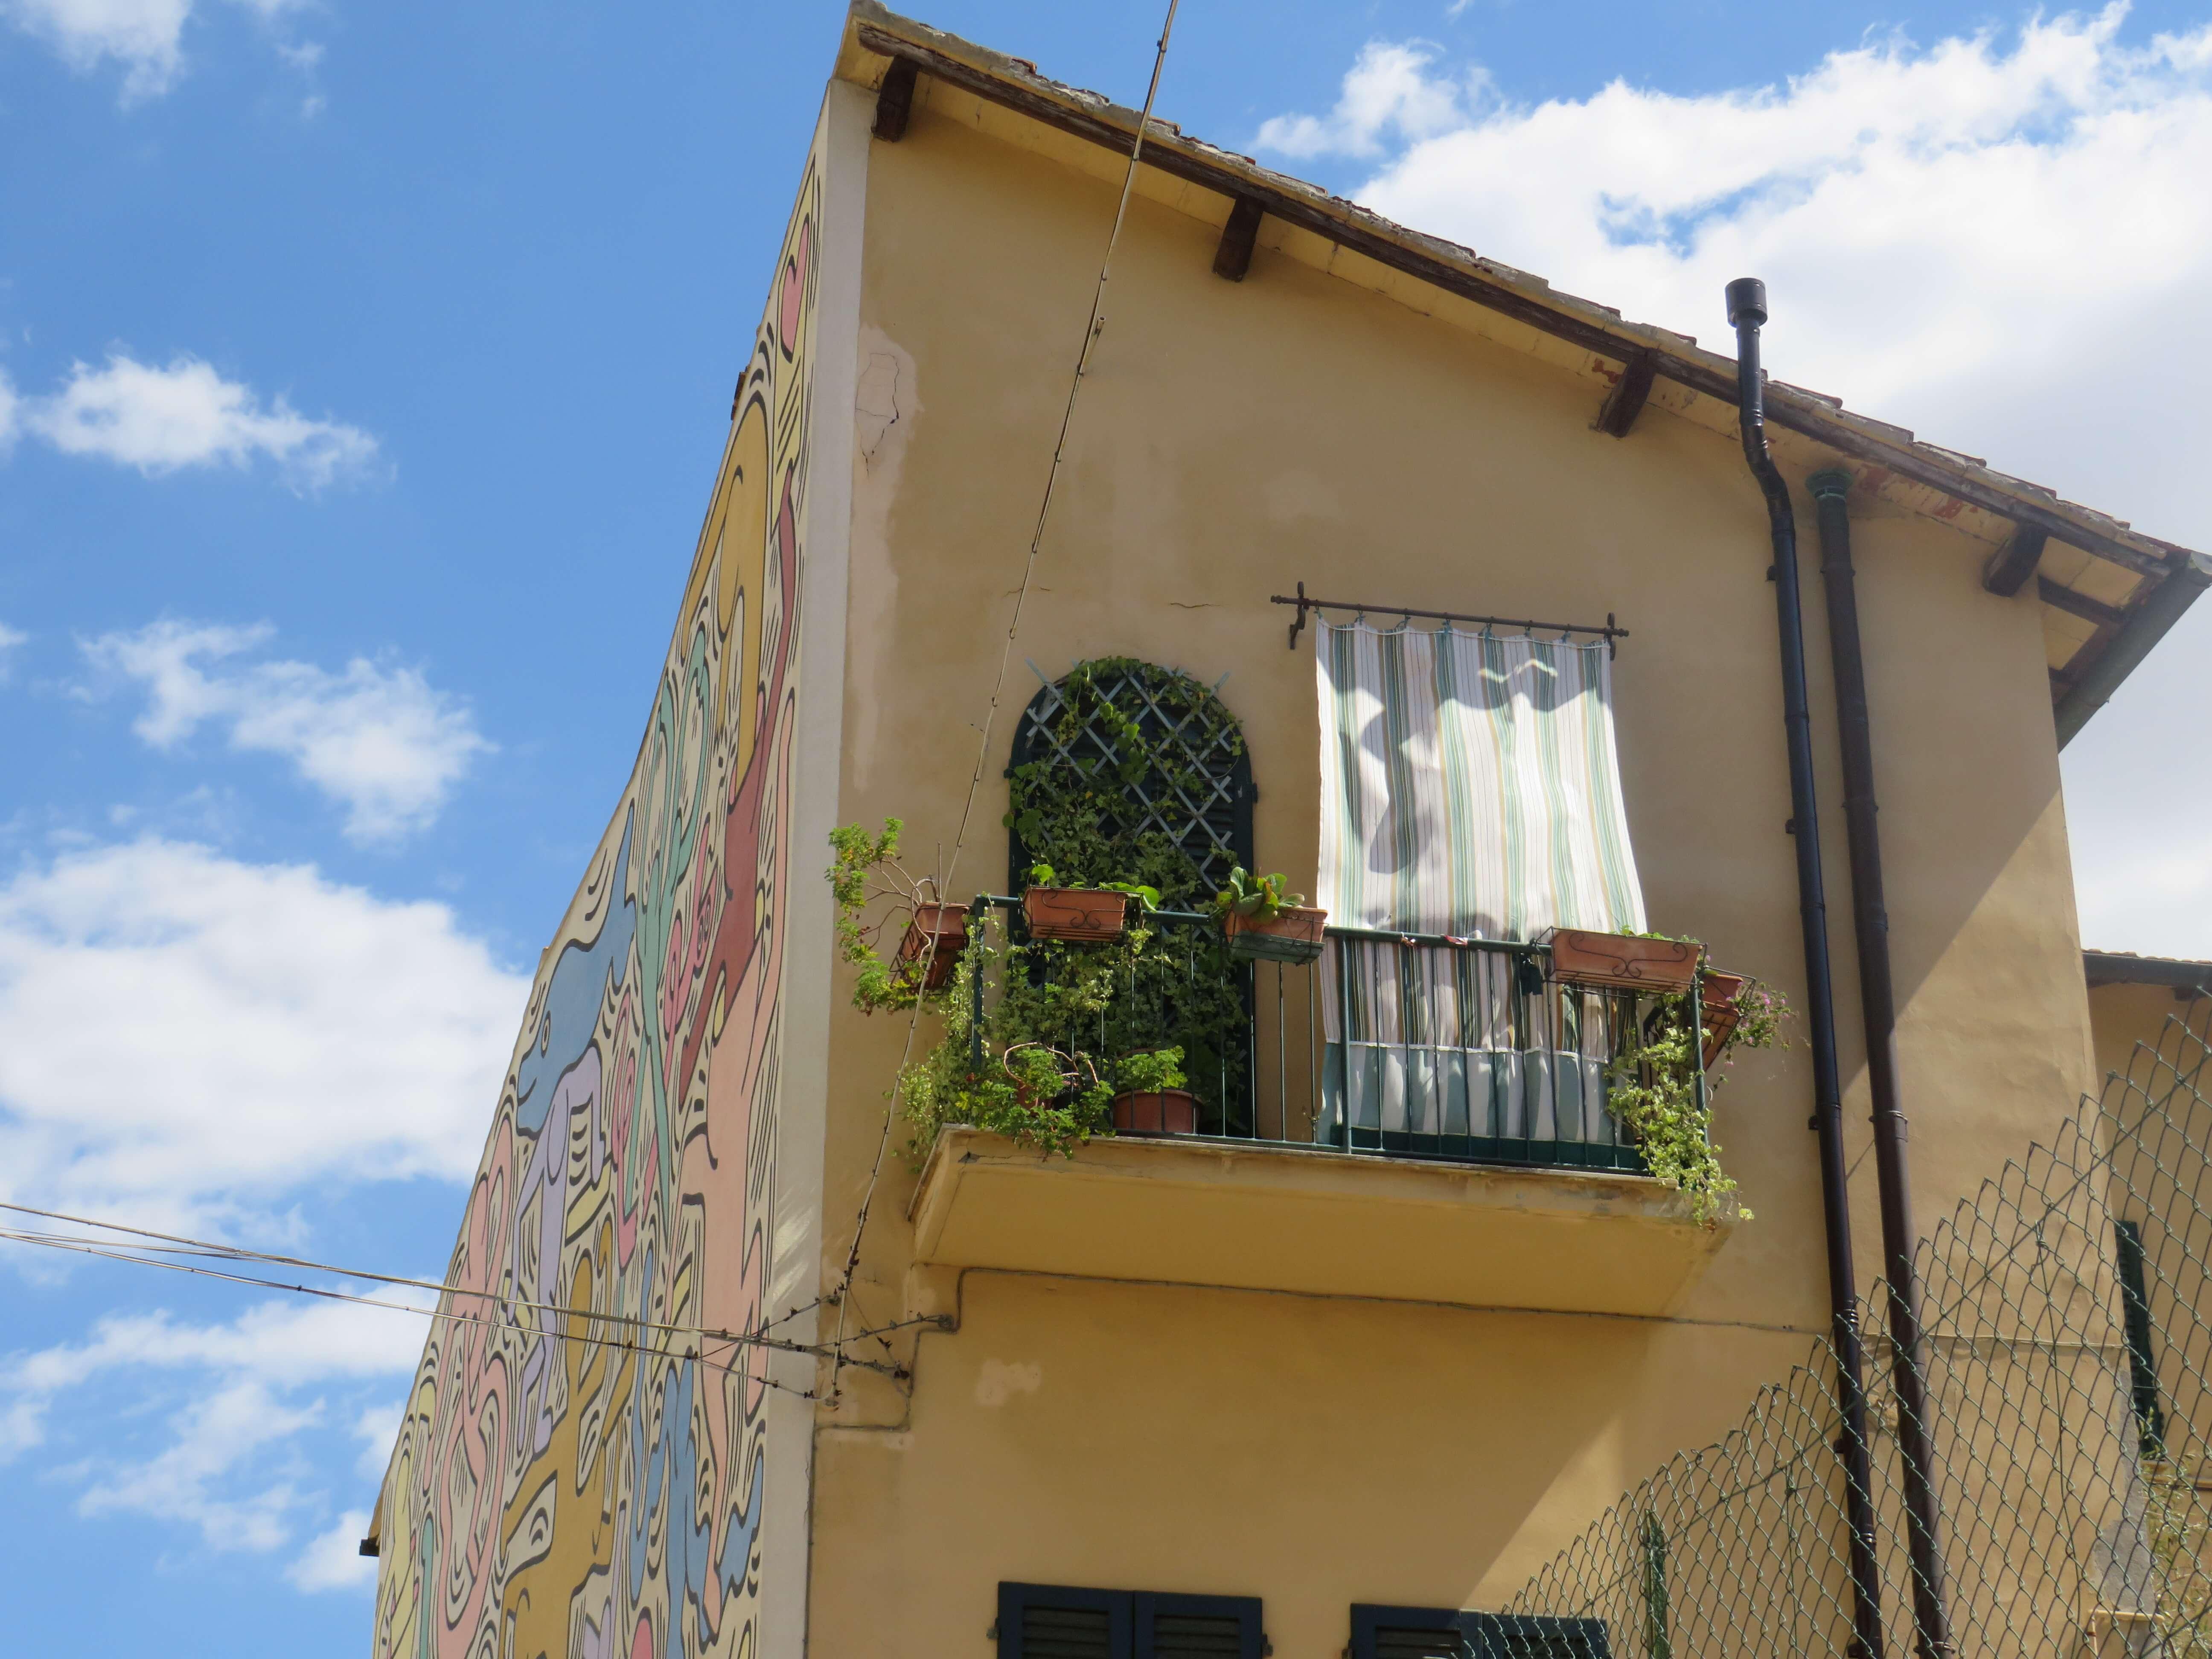 Sehenswürdigkeiten: Murali di Keith Pisa